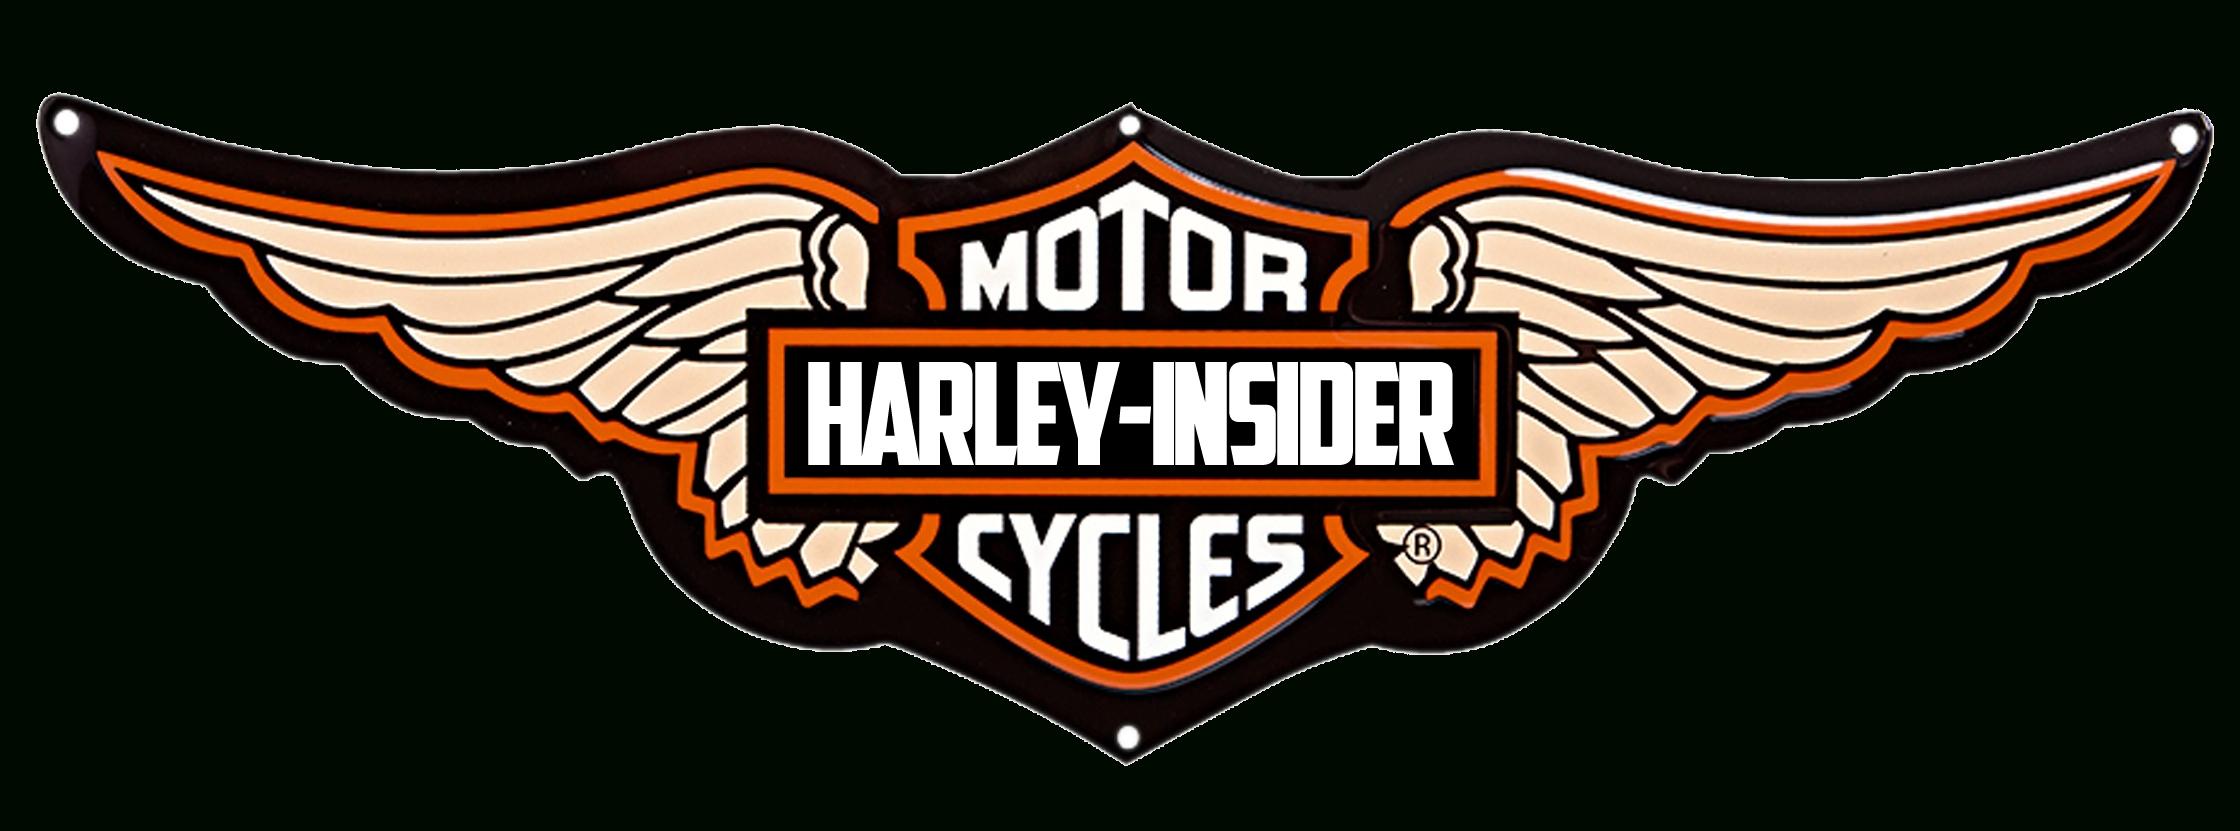 harley davidson motorcycles logo hd cool 7 hd wallpapers | retro